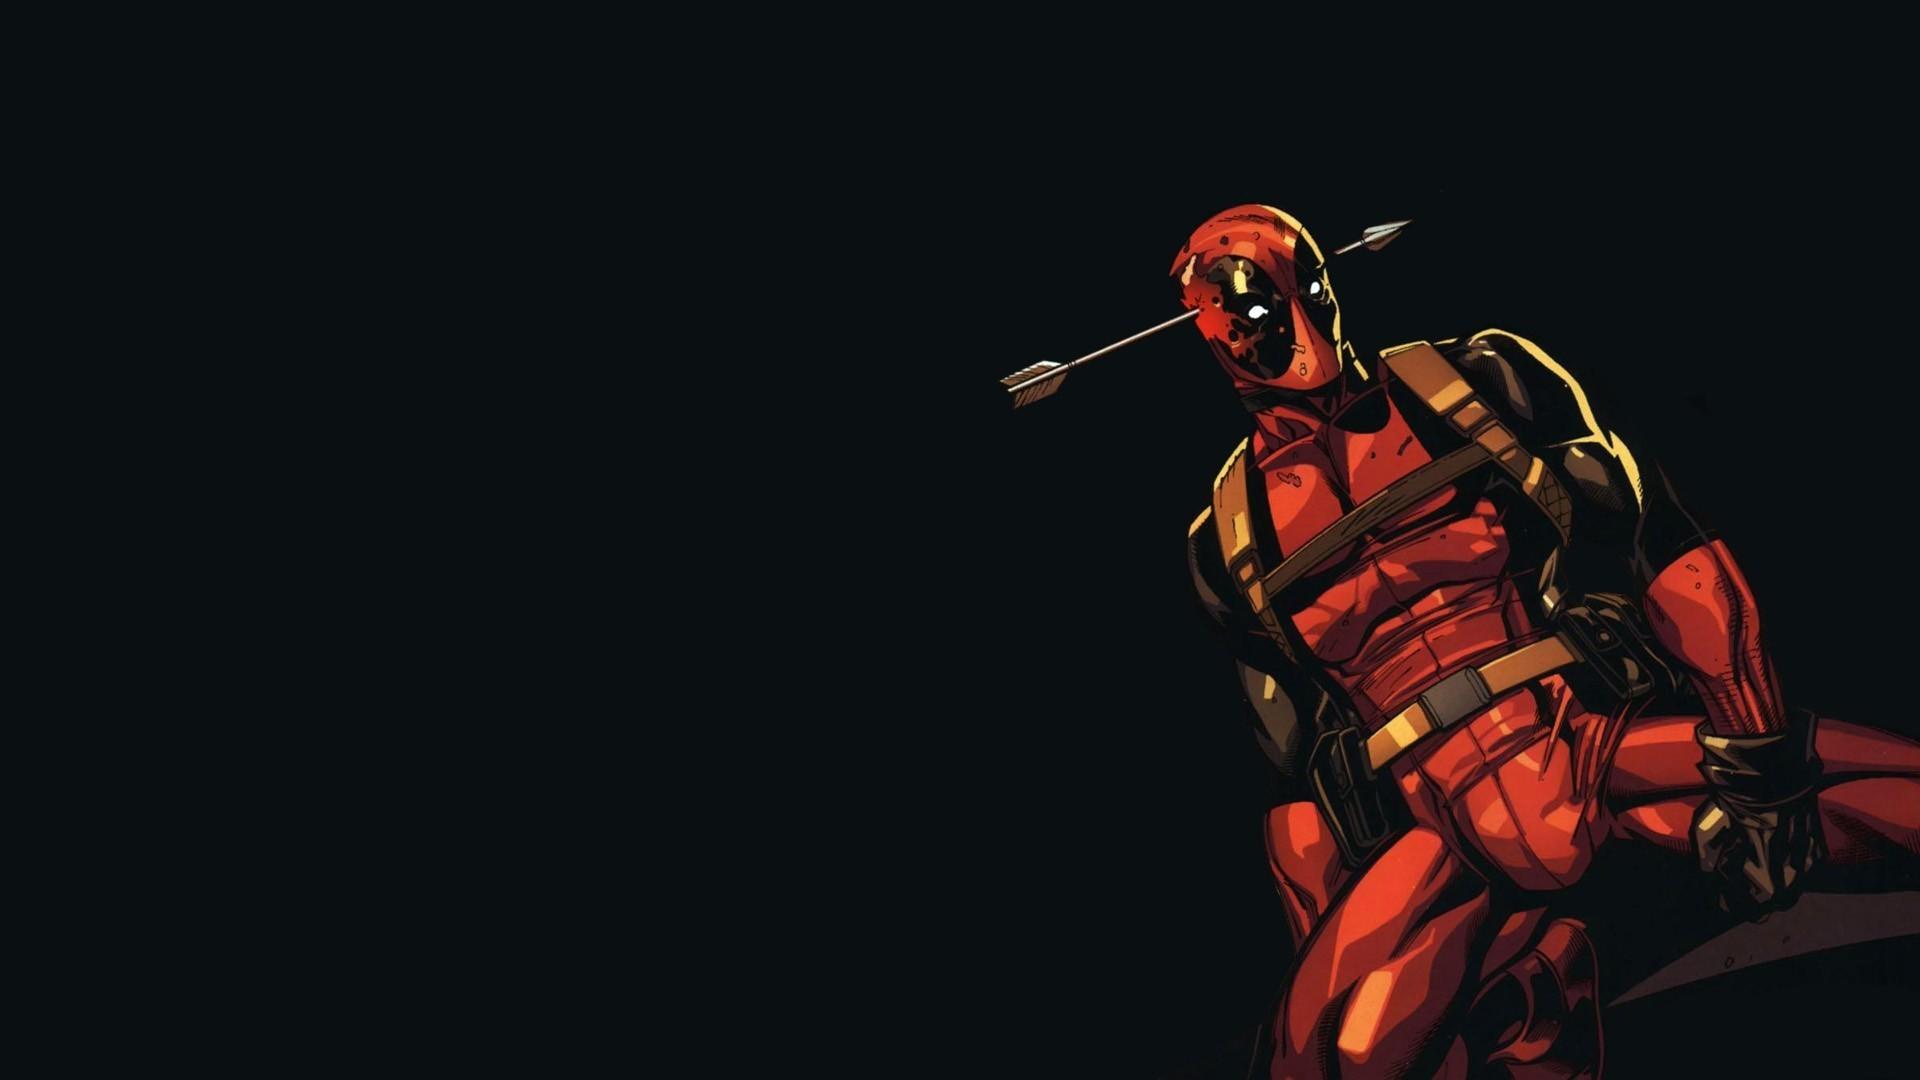 Deadpool, Artwork, Black Background, Simple Background, - Deadpool 1920 X 1080 - HD Wallpaper